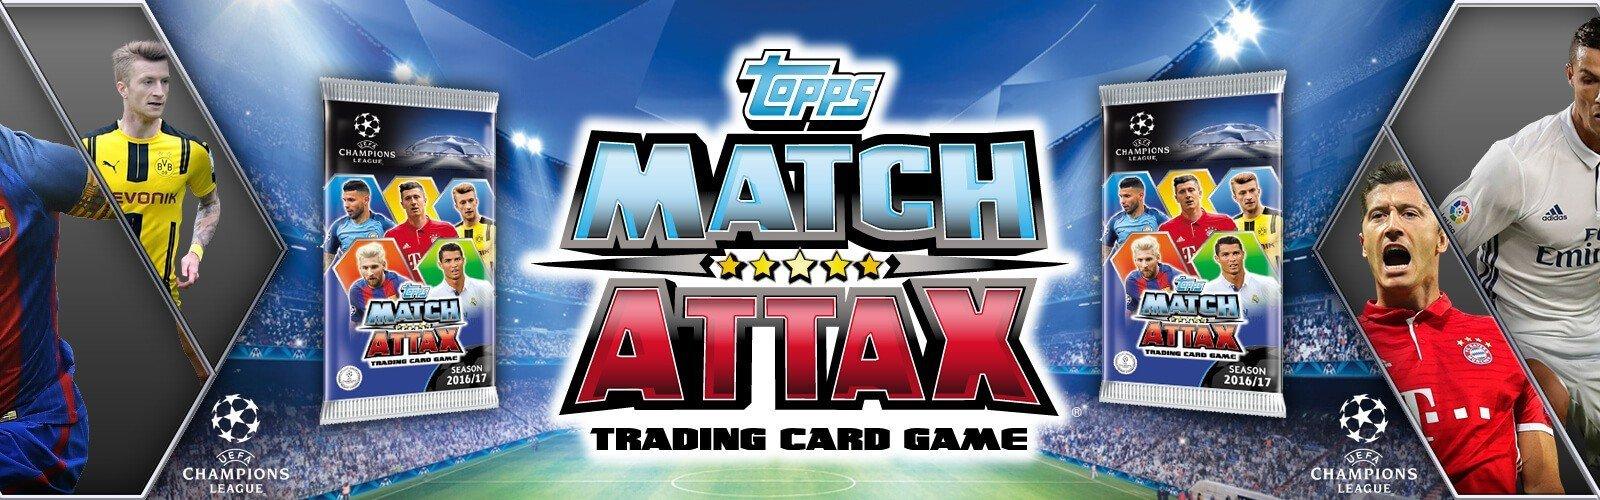 Match Attax Champions League